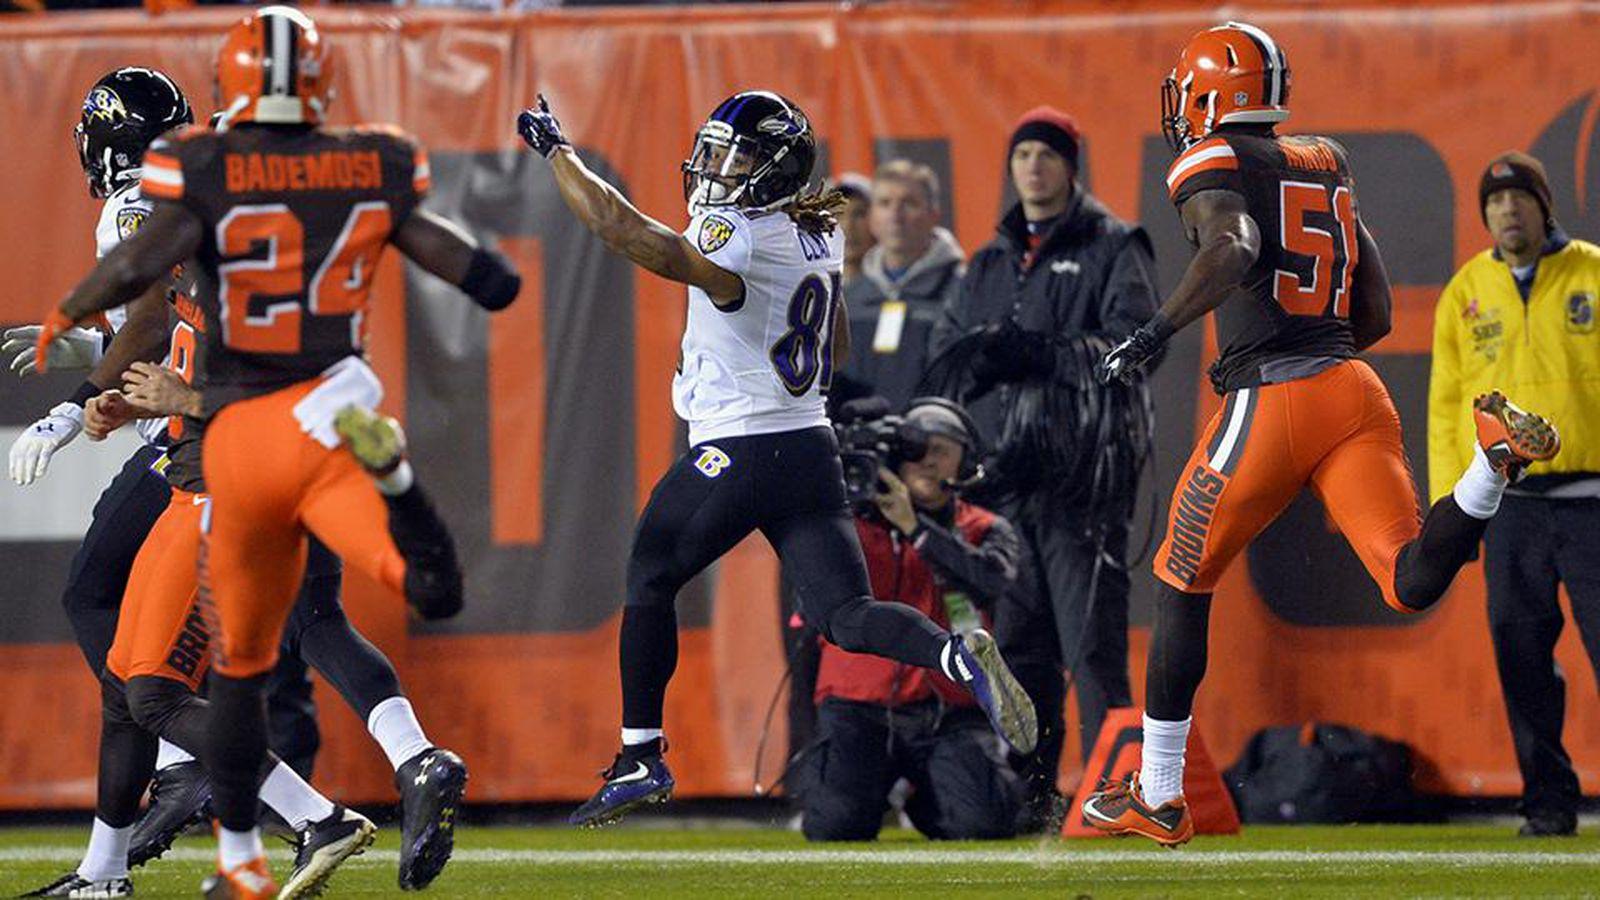 Browns-ravens-kaelin-clay-punt-return-touchdown-video.0.0